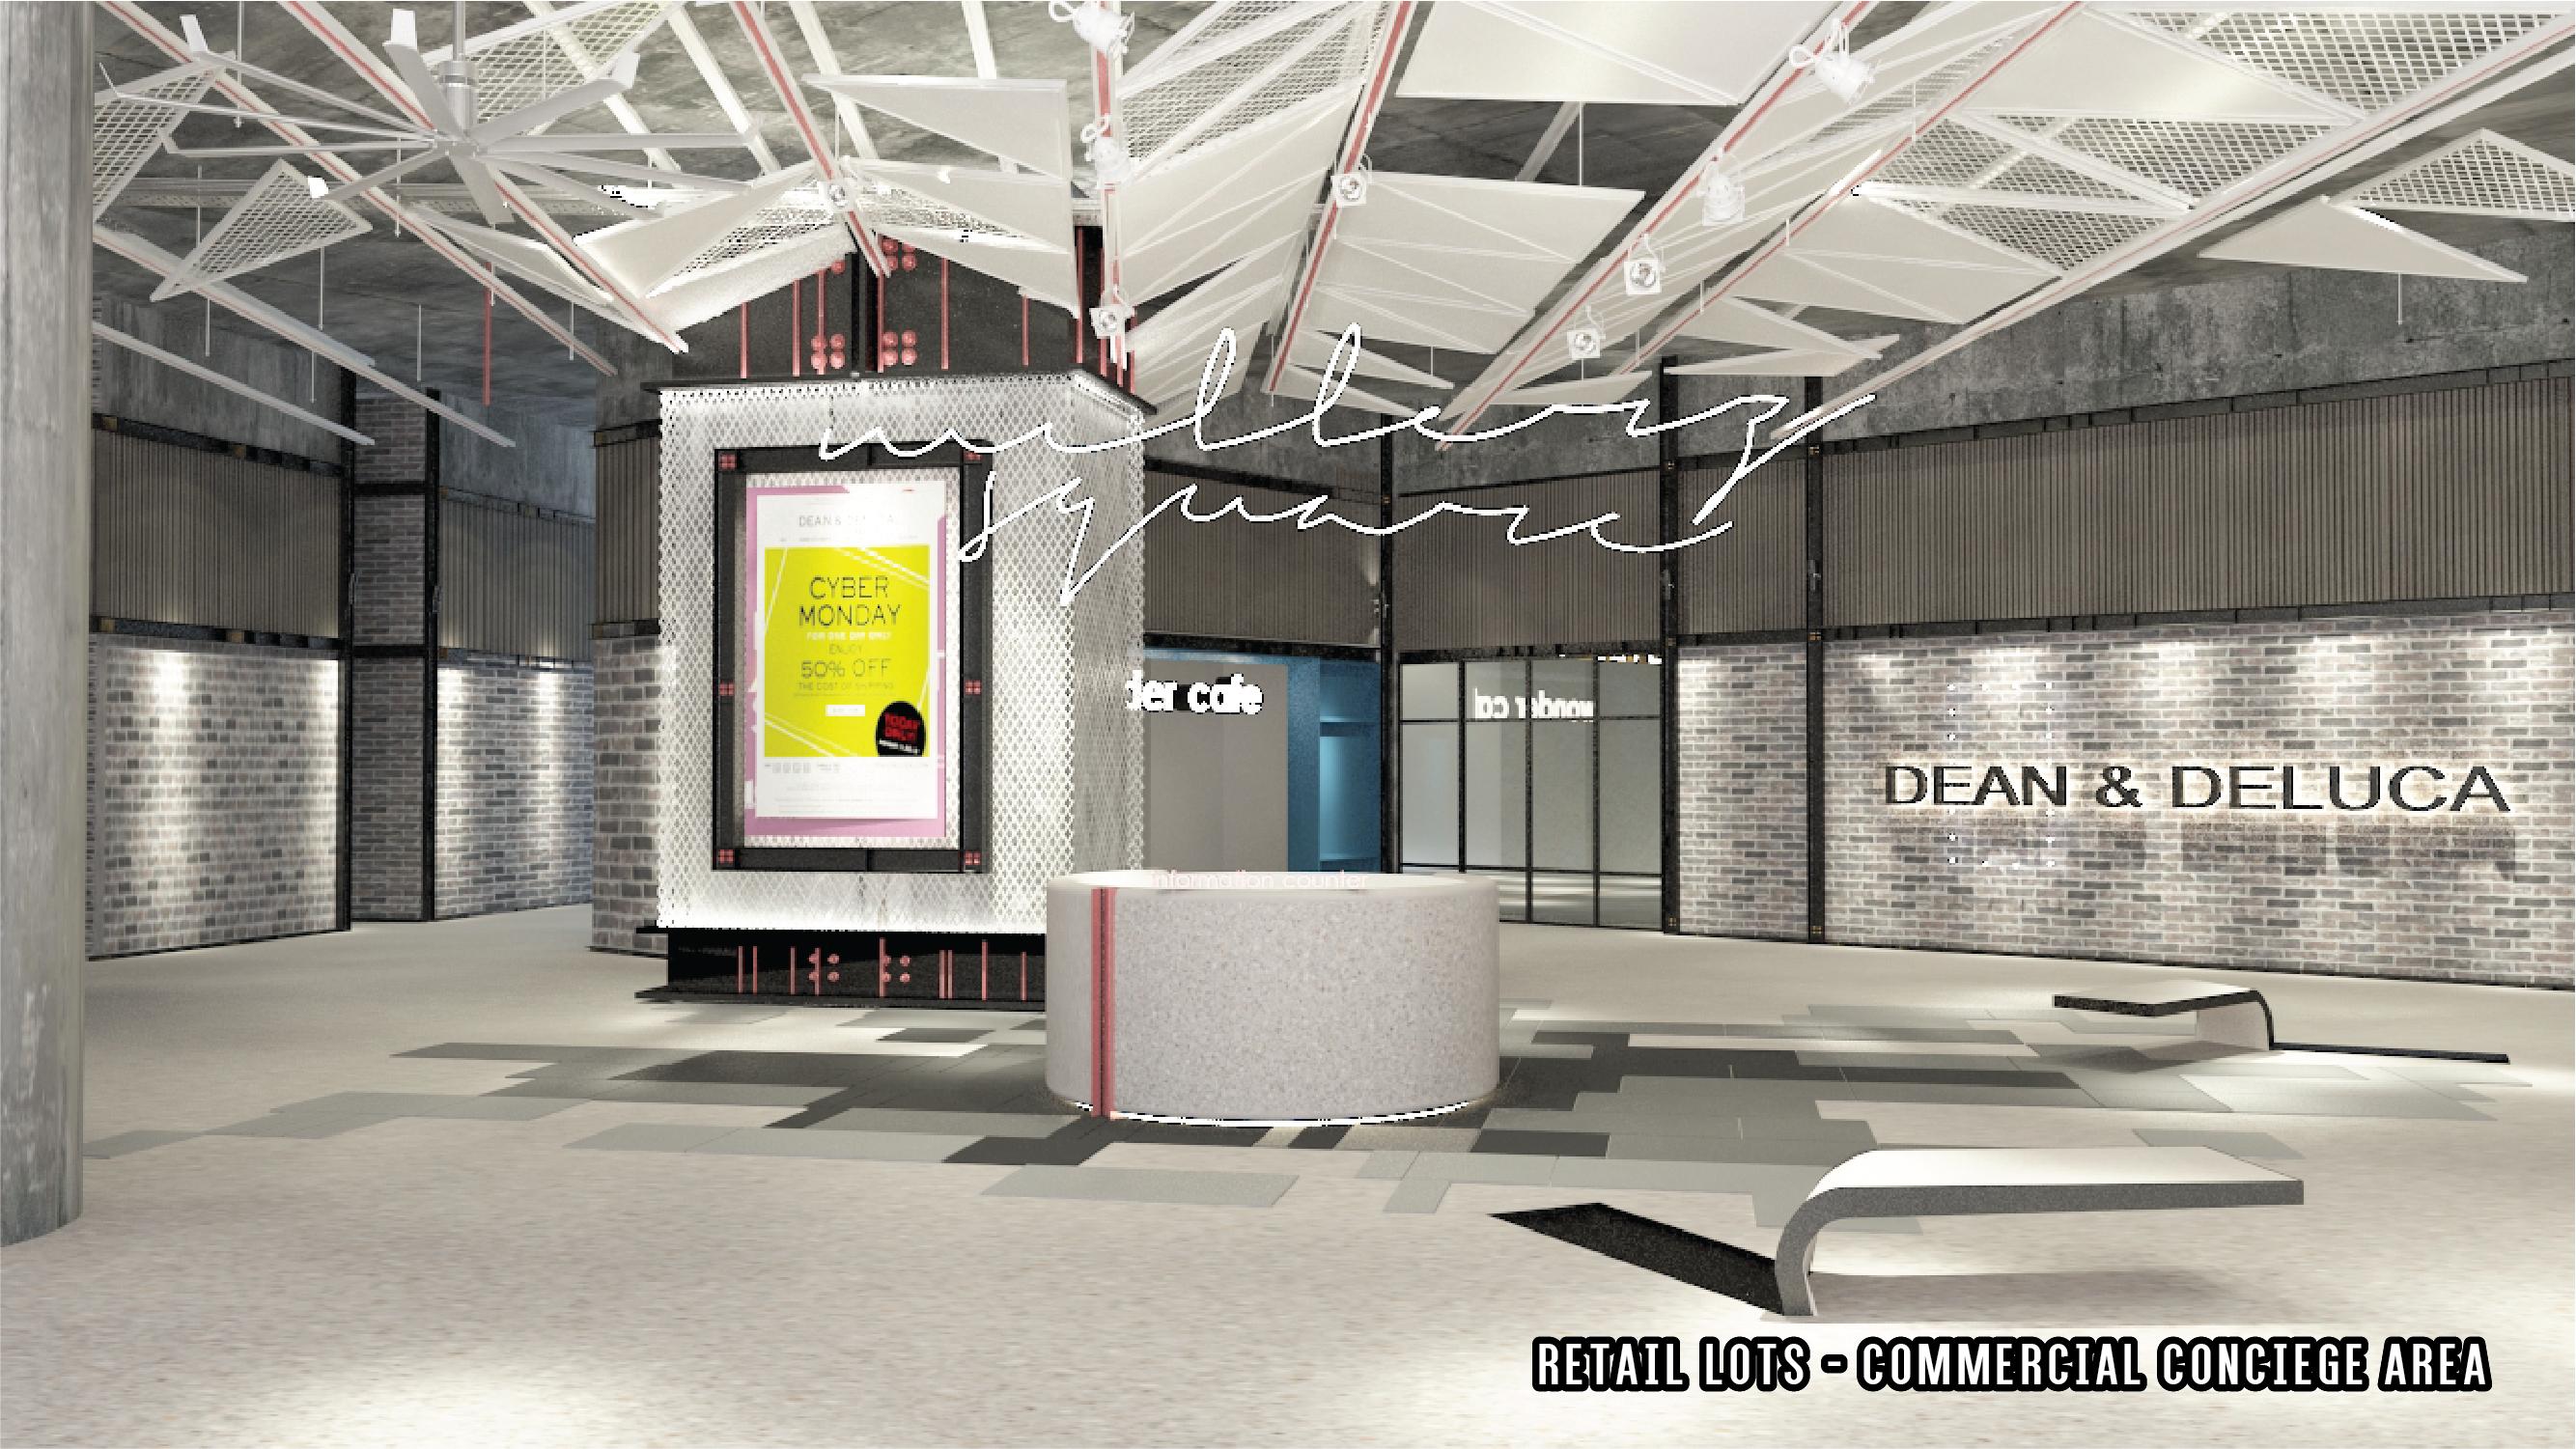 Millerz RetailLots_CommercialConciergeArea